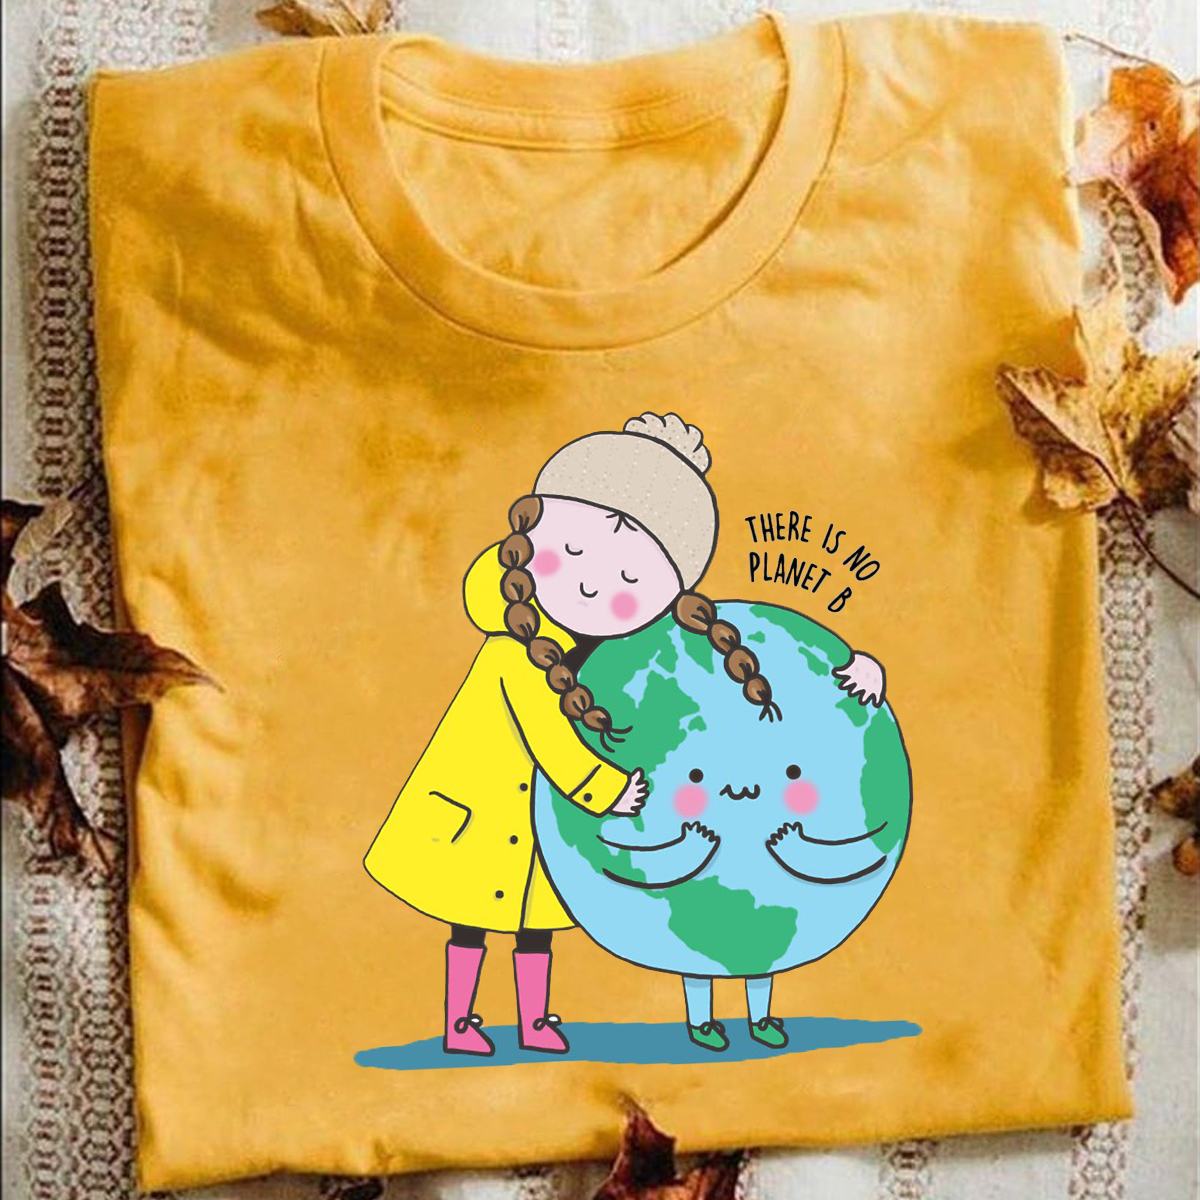 Greta Thunberg There Is No Planet B-Save The Planet Shirt XS-3XL Mens Shirt High Quality 100% Cotton T-shirts For Men And Women